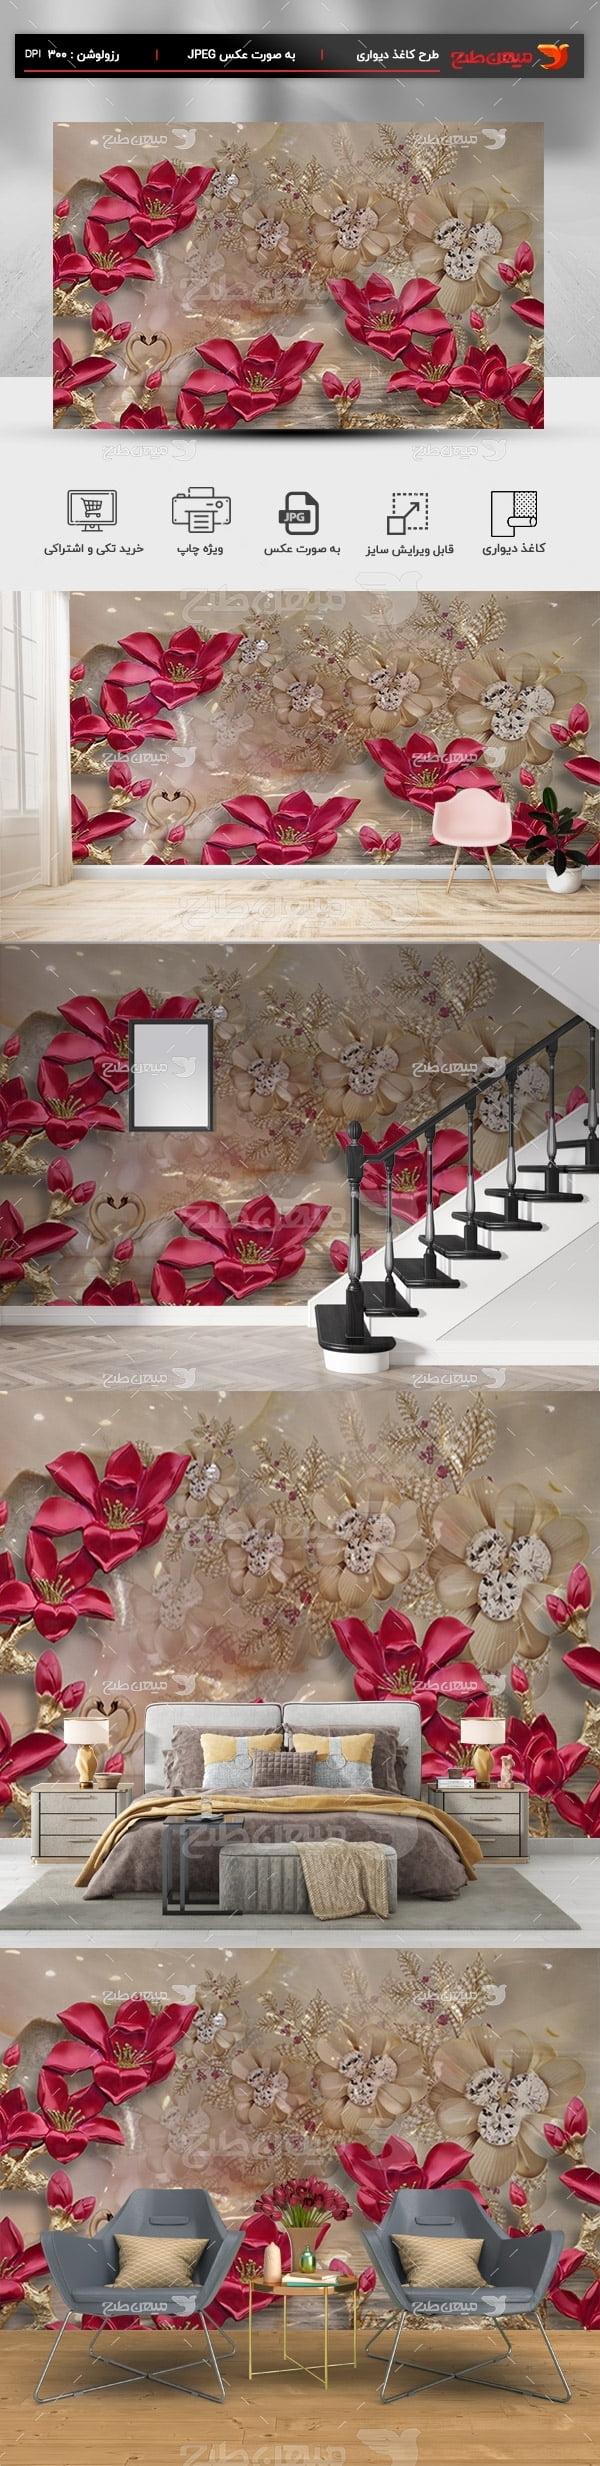 پوستر کاغذ دیواری سه بعدی طرح گل قرمز و طلایی